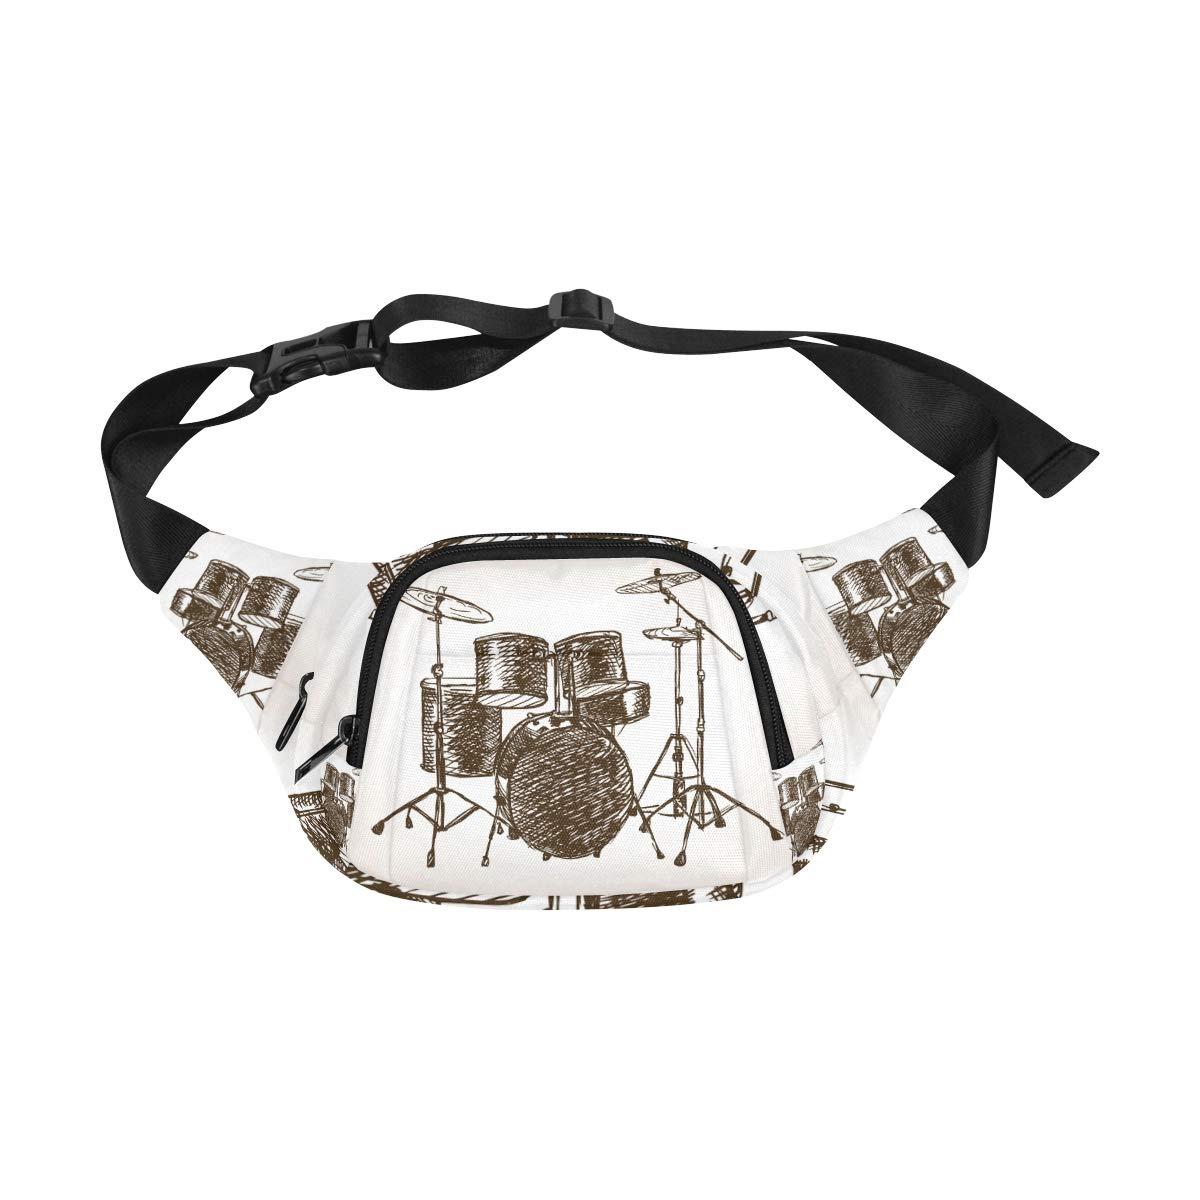 Hand Drawn Musical Drum Set Fenny Packs Waist Bags Adjustable Belt Waterproof Nylon Travel Running Sport Vacation Party For Men Women Boys Girls Kids